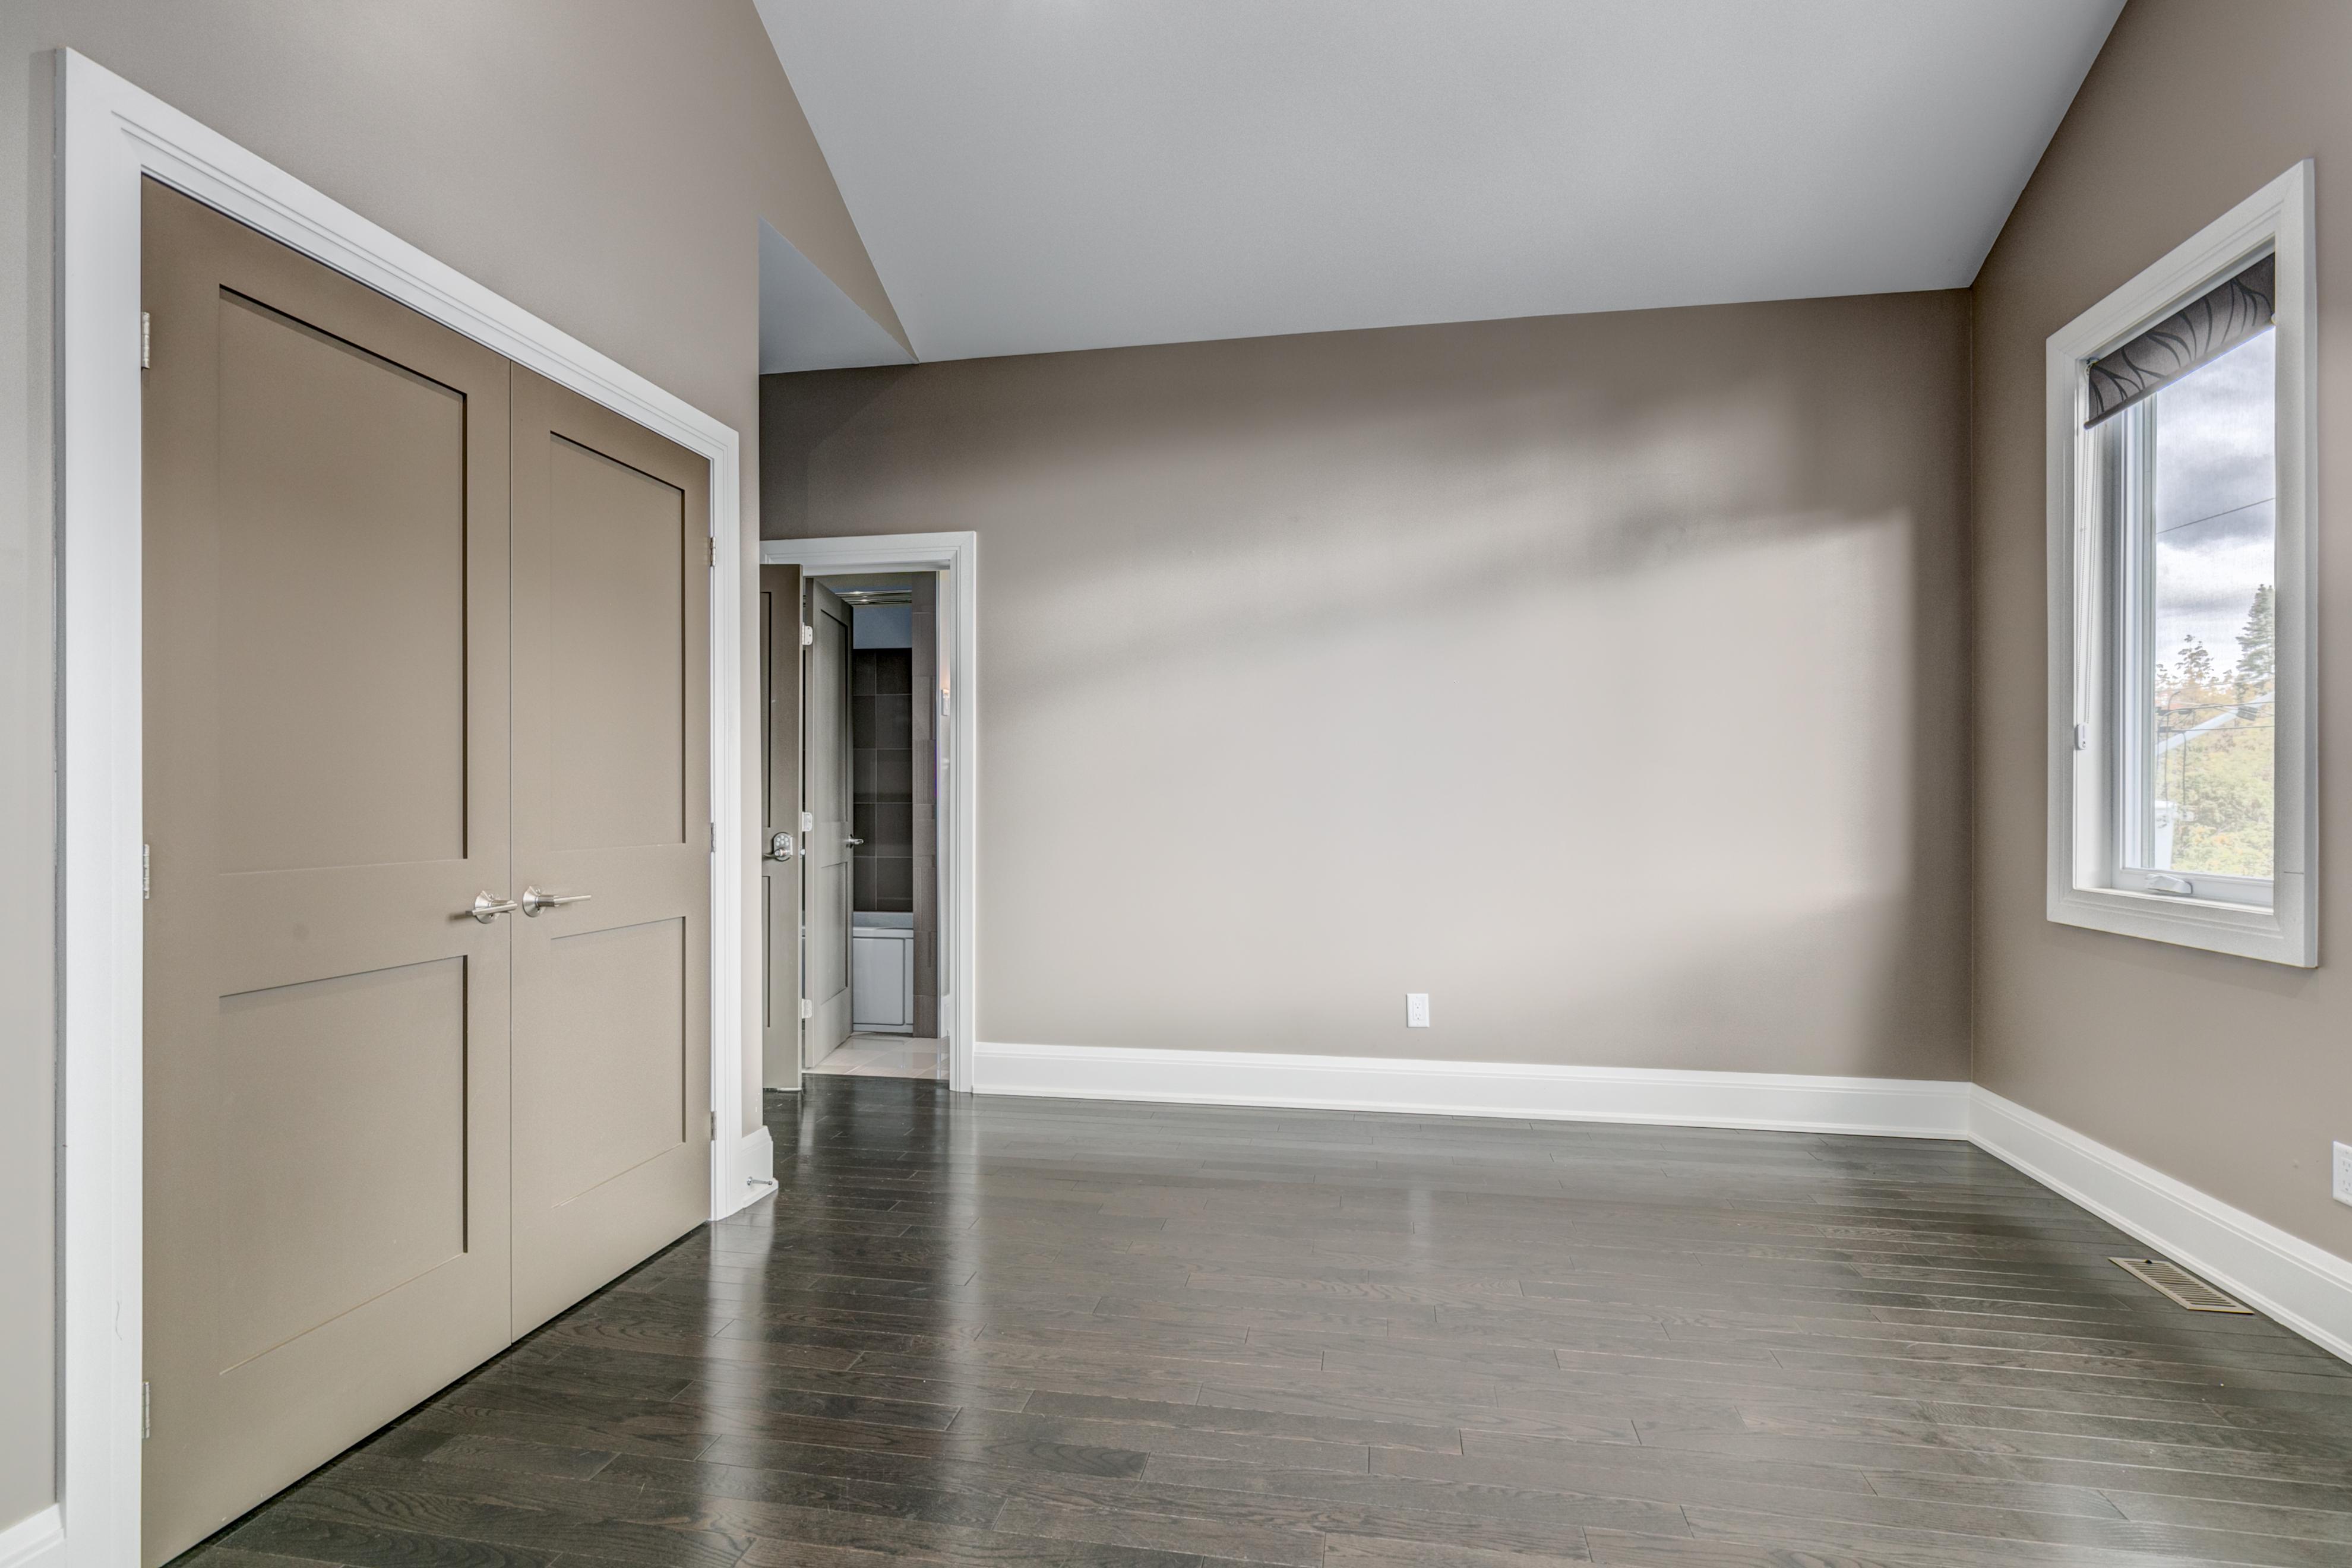 1601 Kingsdale Second Bedroom 2